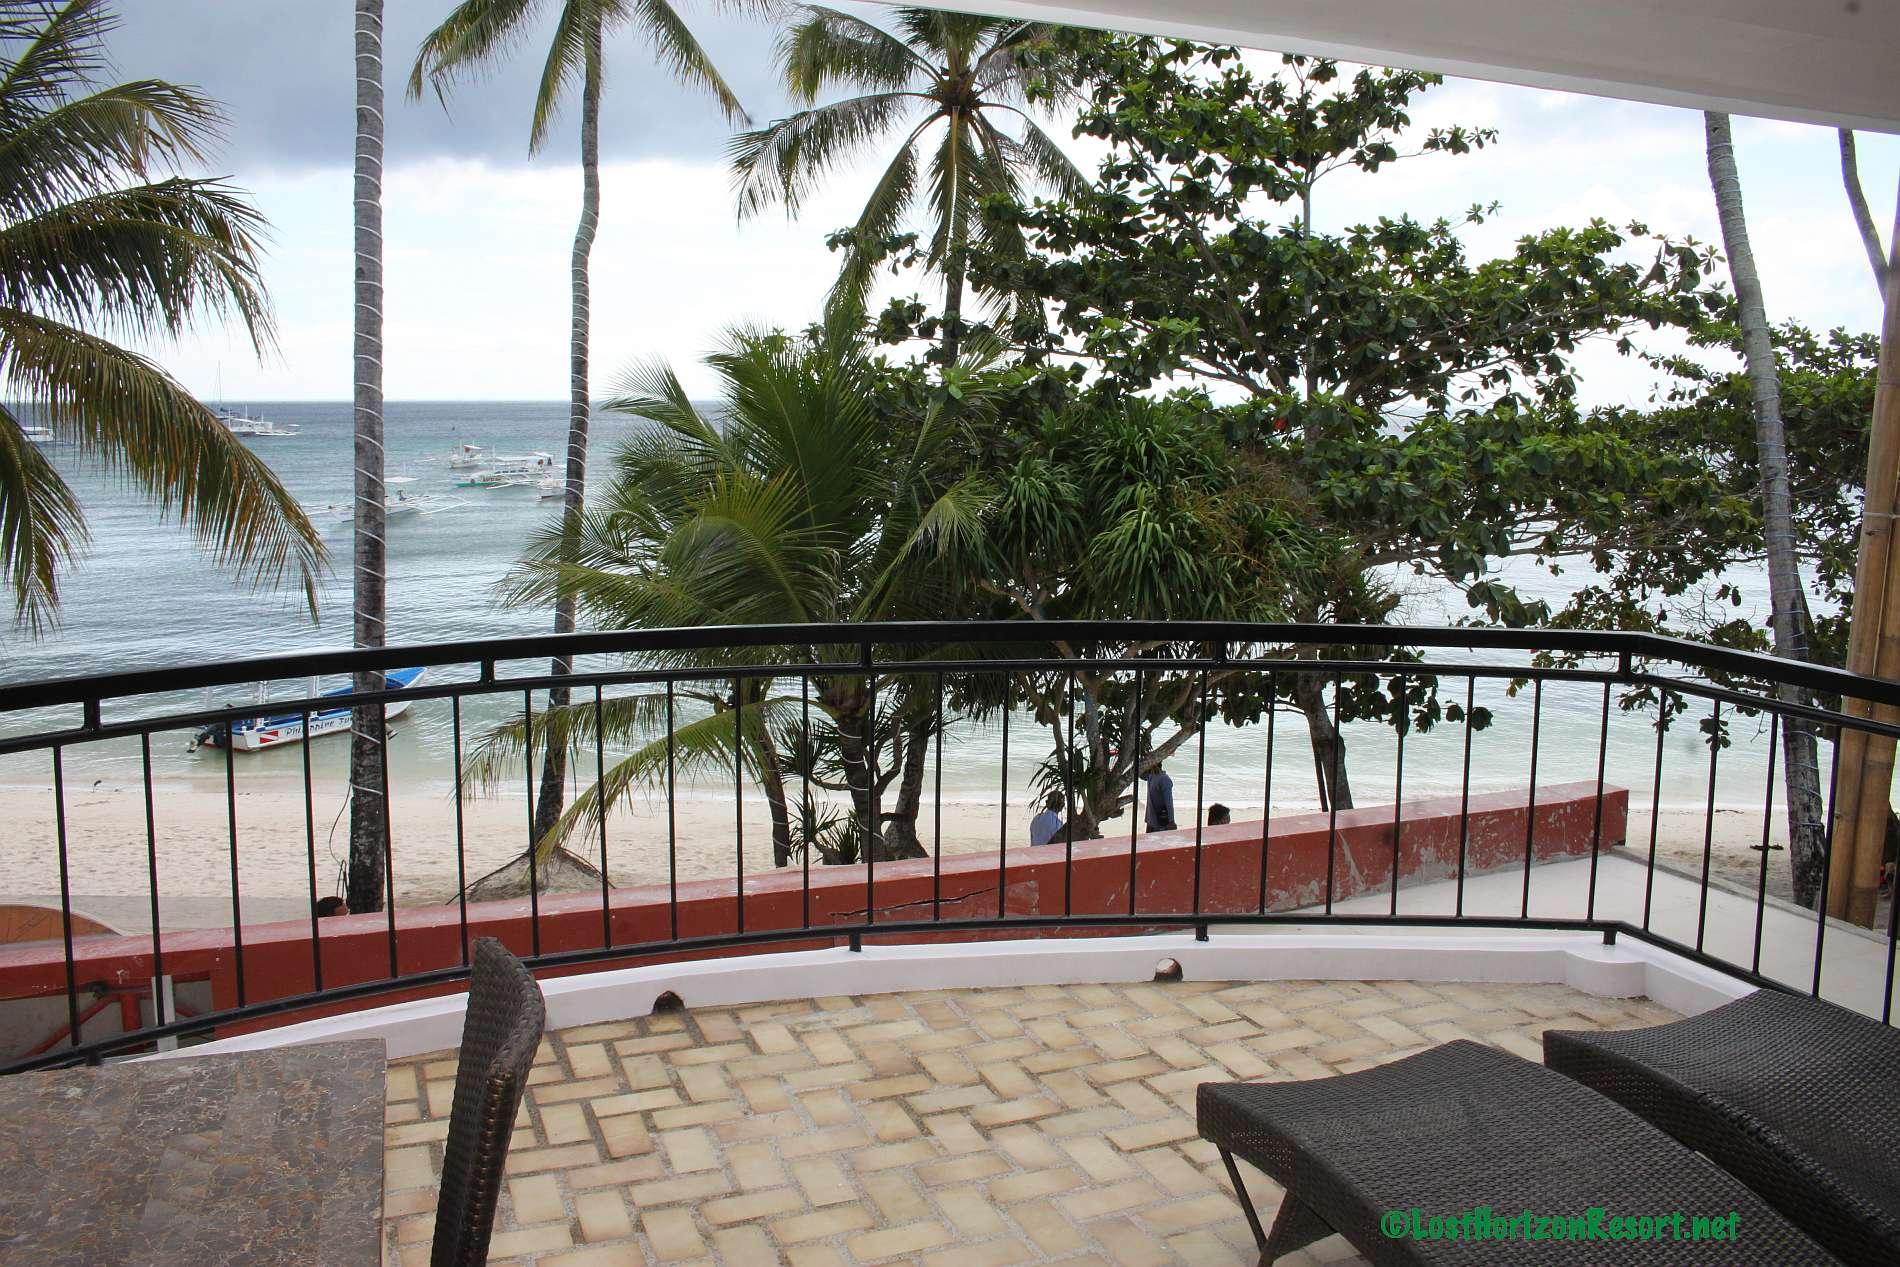 Lost-Horizon-Beach-Resort-Alona-Beach-Panglao-Bohol-Philippines-sun-view-room018